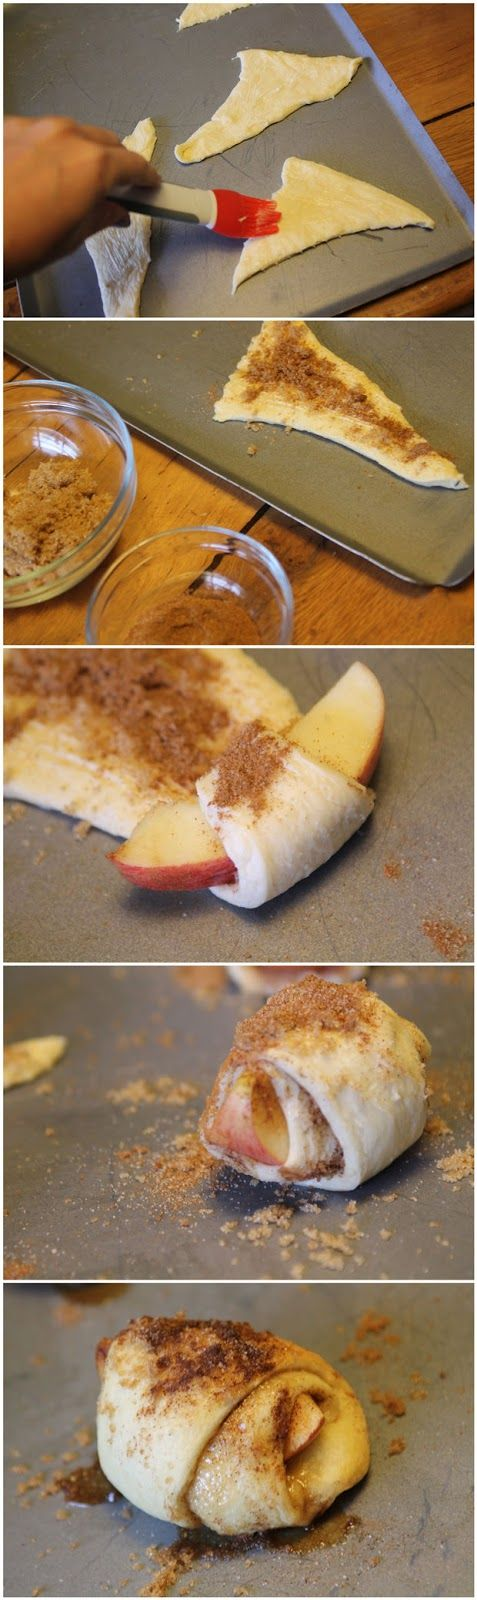 Bite Size Apple Pies - Best of Recipe #food #recipe